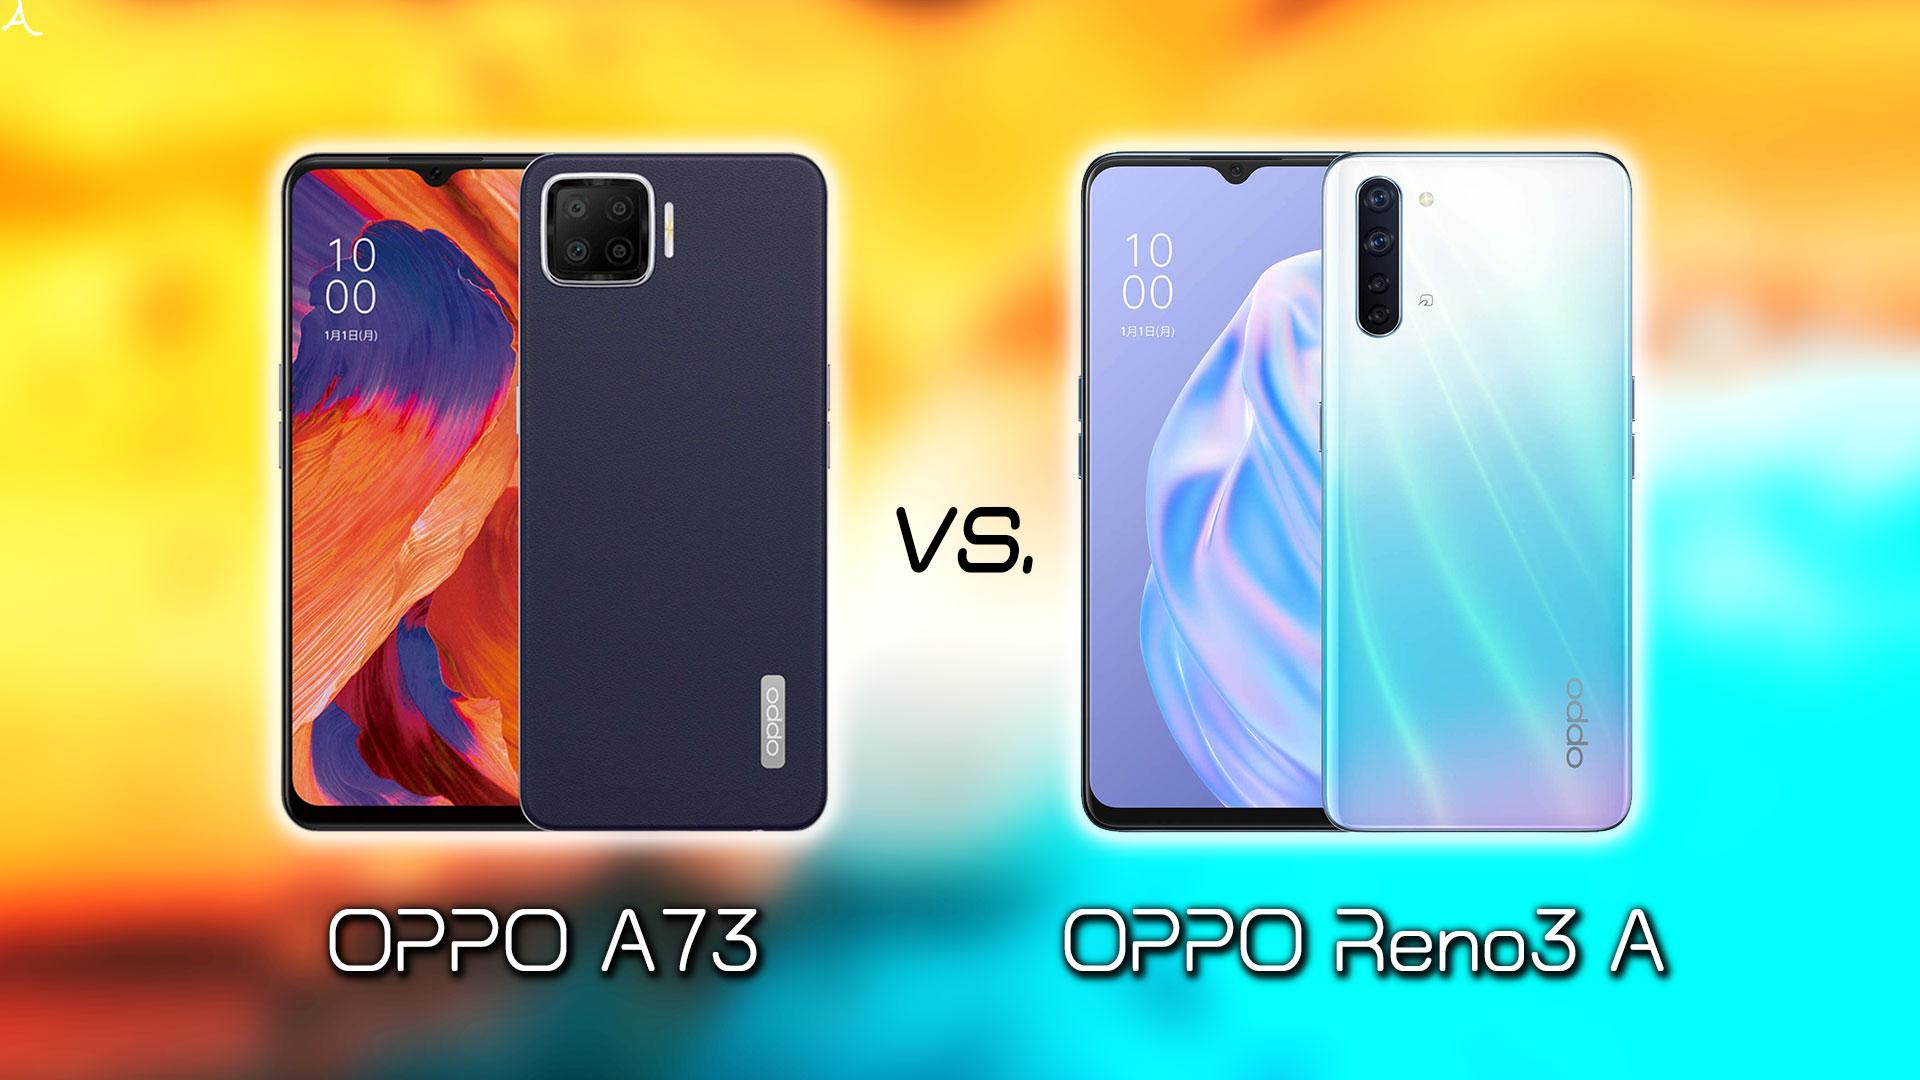 「OPPO A73」と「OPPO Reno3 A」の違いを比較:どっちを買う?